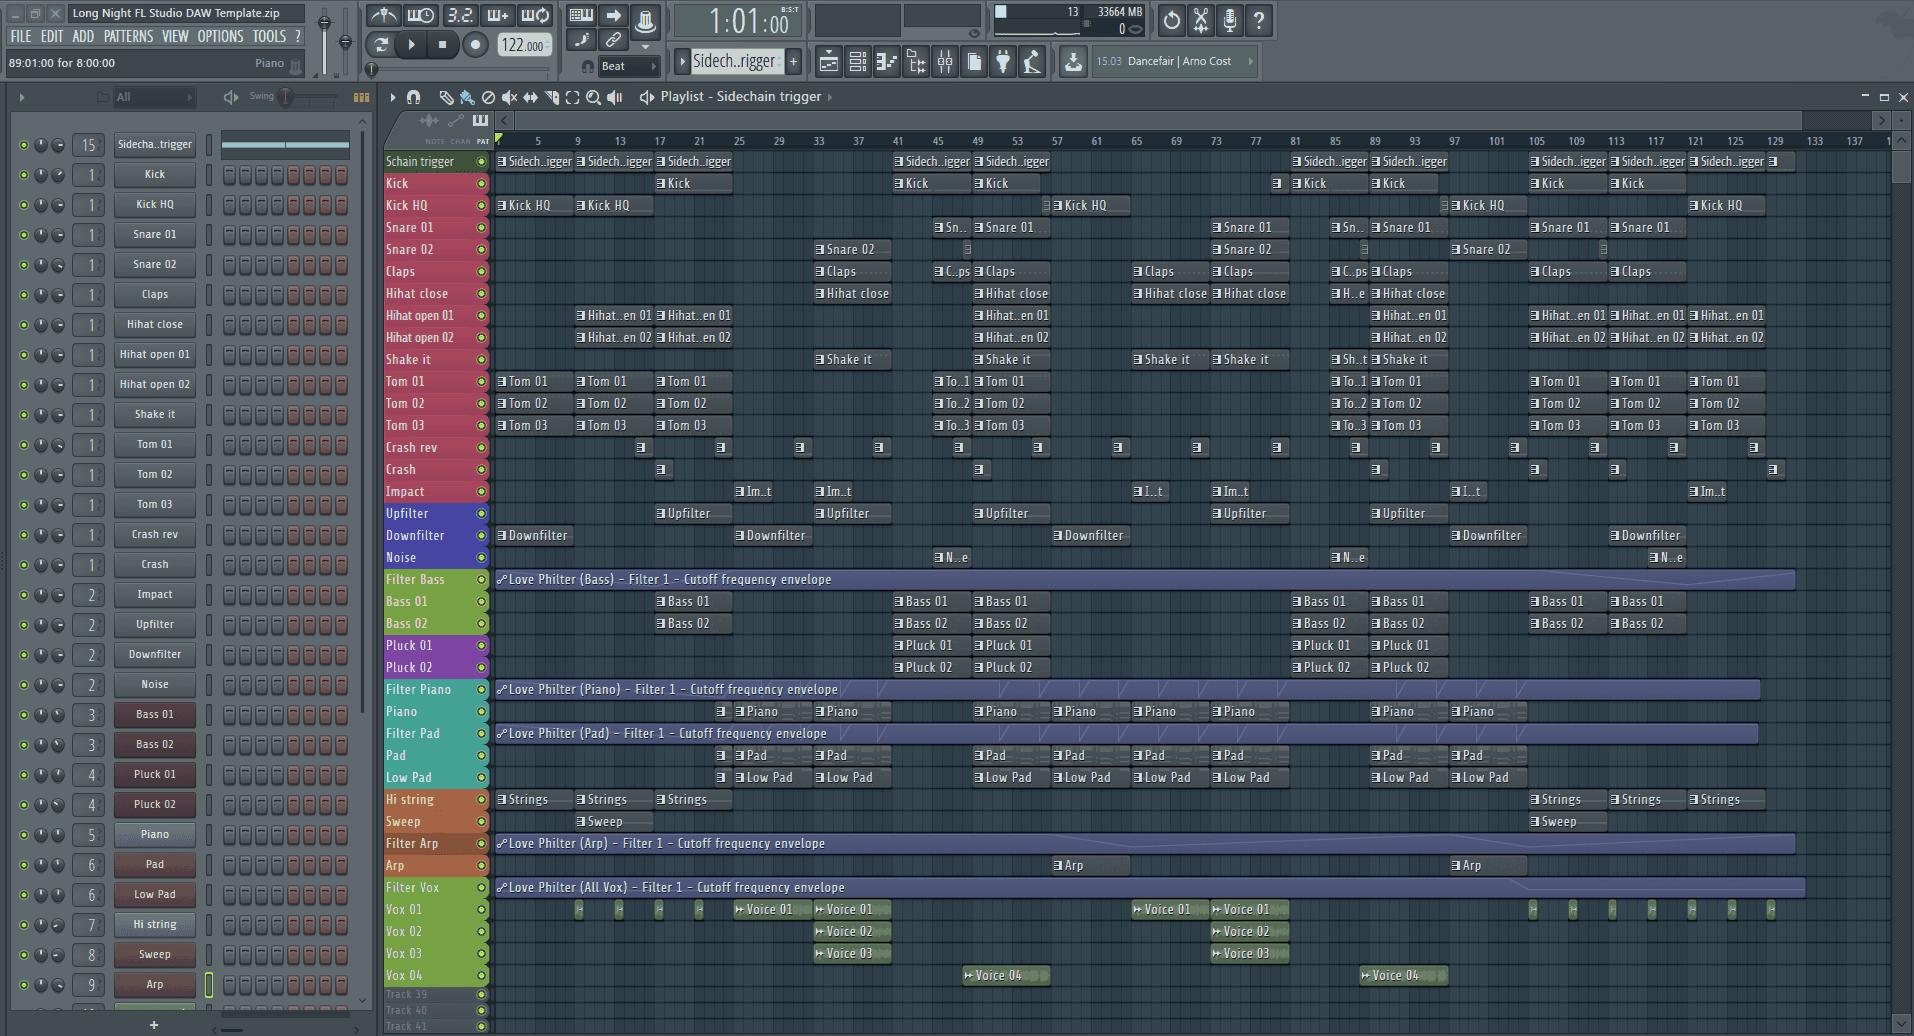 Long Night FL Studio DAW Template